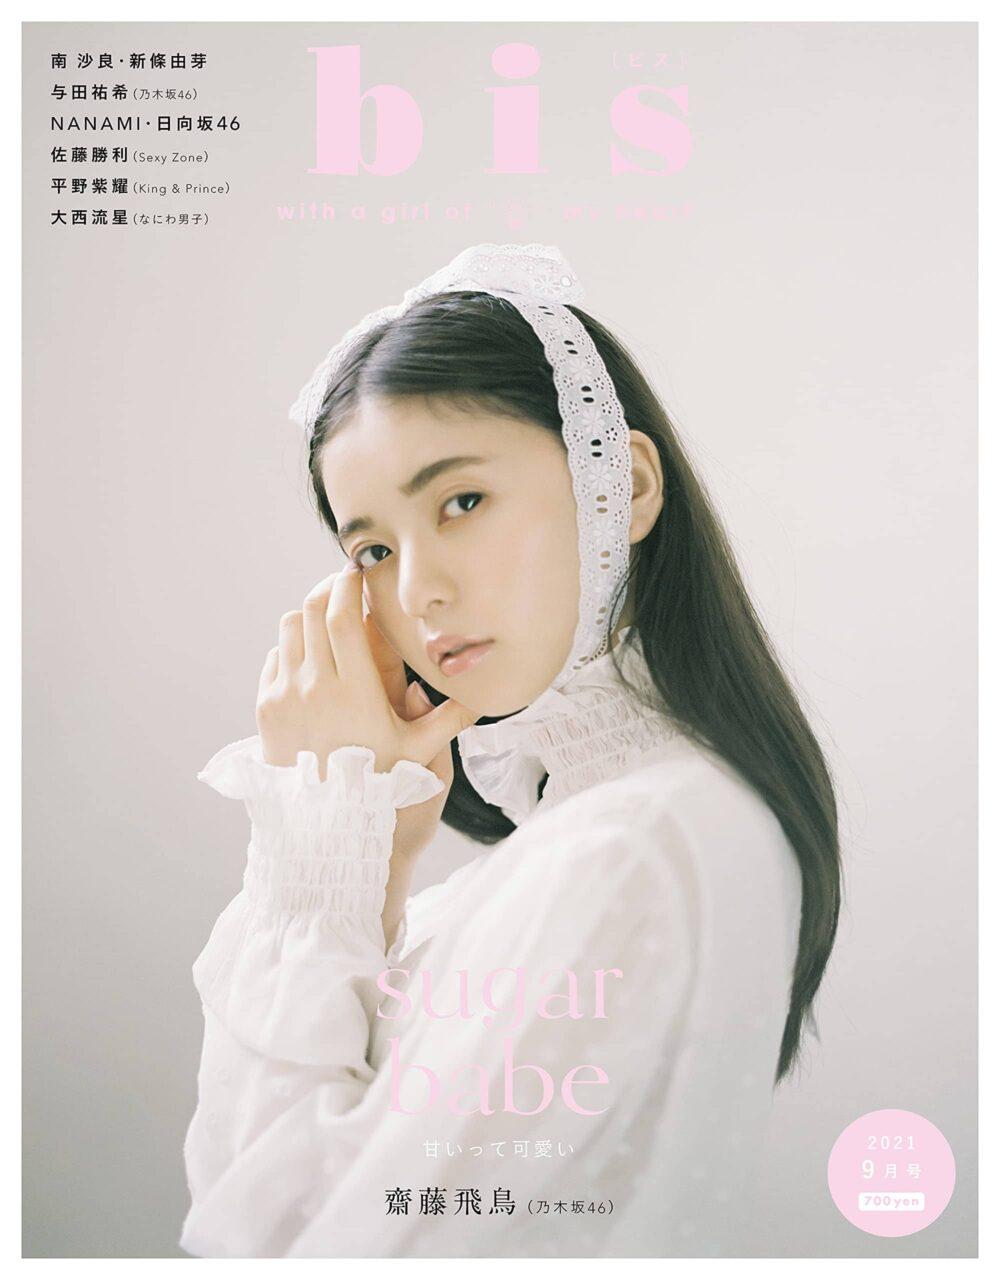 乃木坂46 齋藤飛鳥が表紙に登場!「bis 2021年9月号」7/30発売!